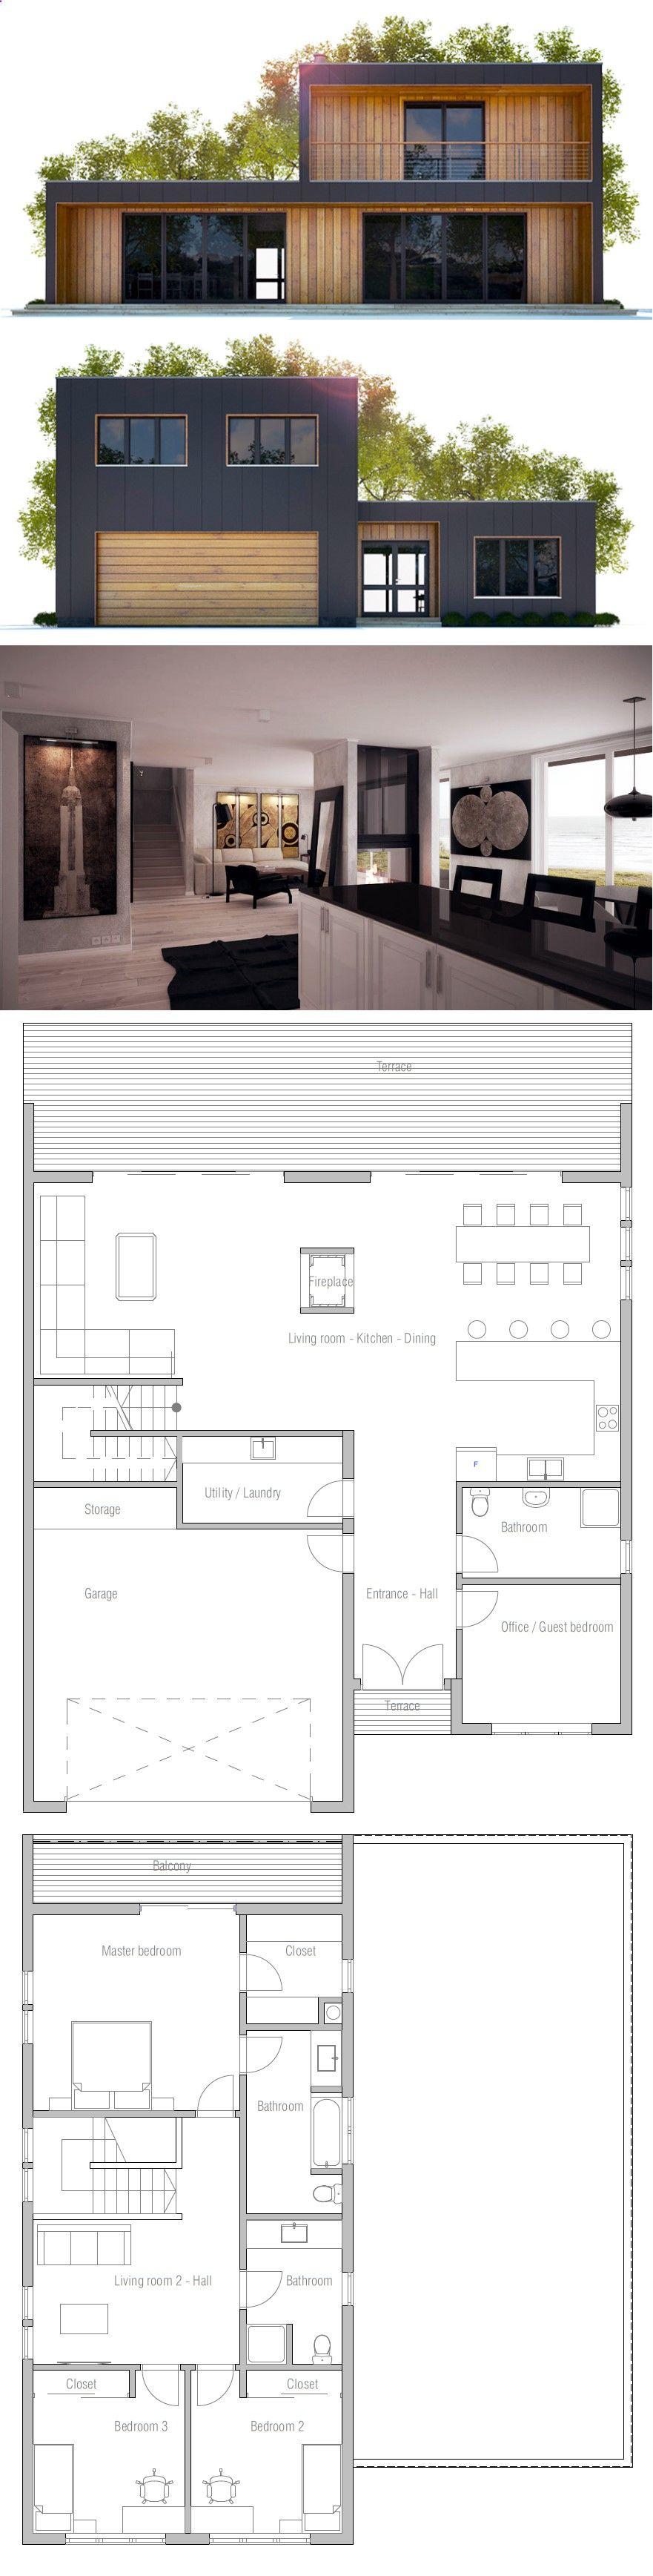 Container house house plan distribución u who else wants simple